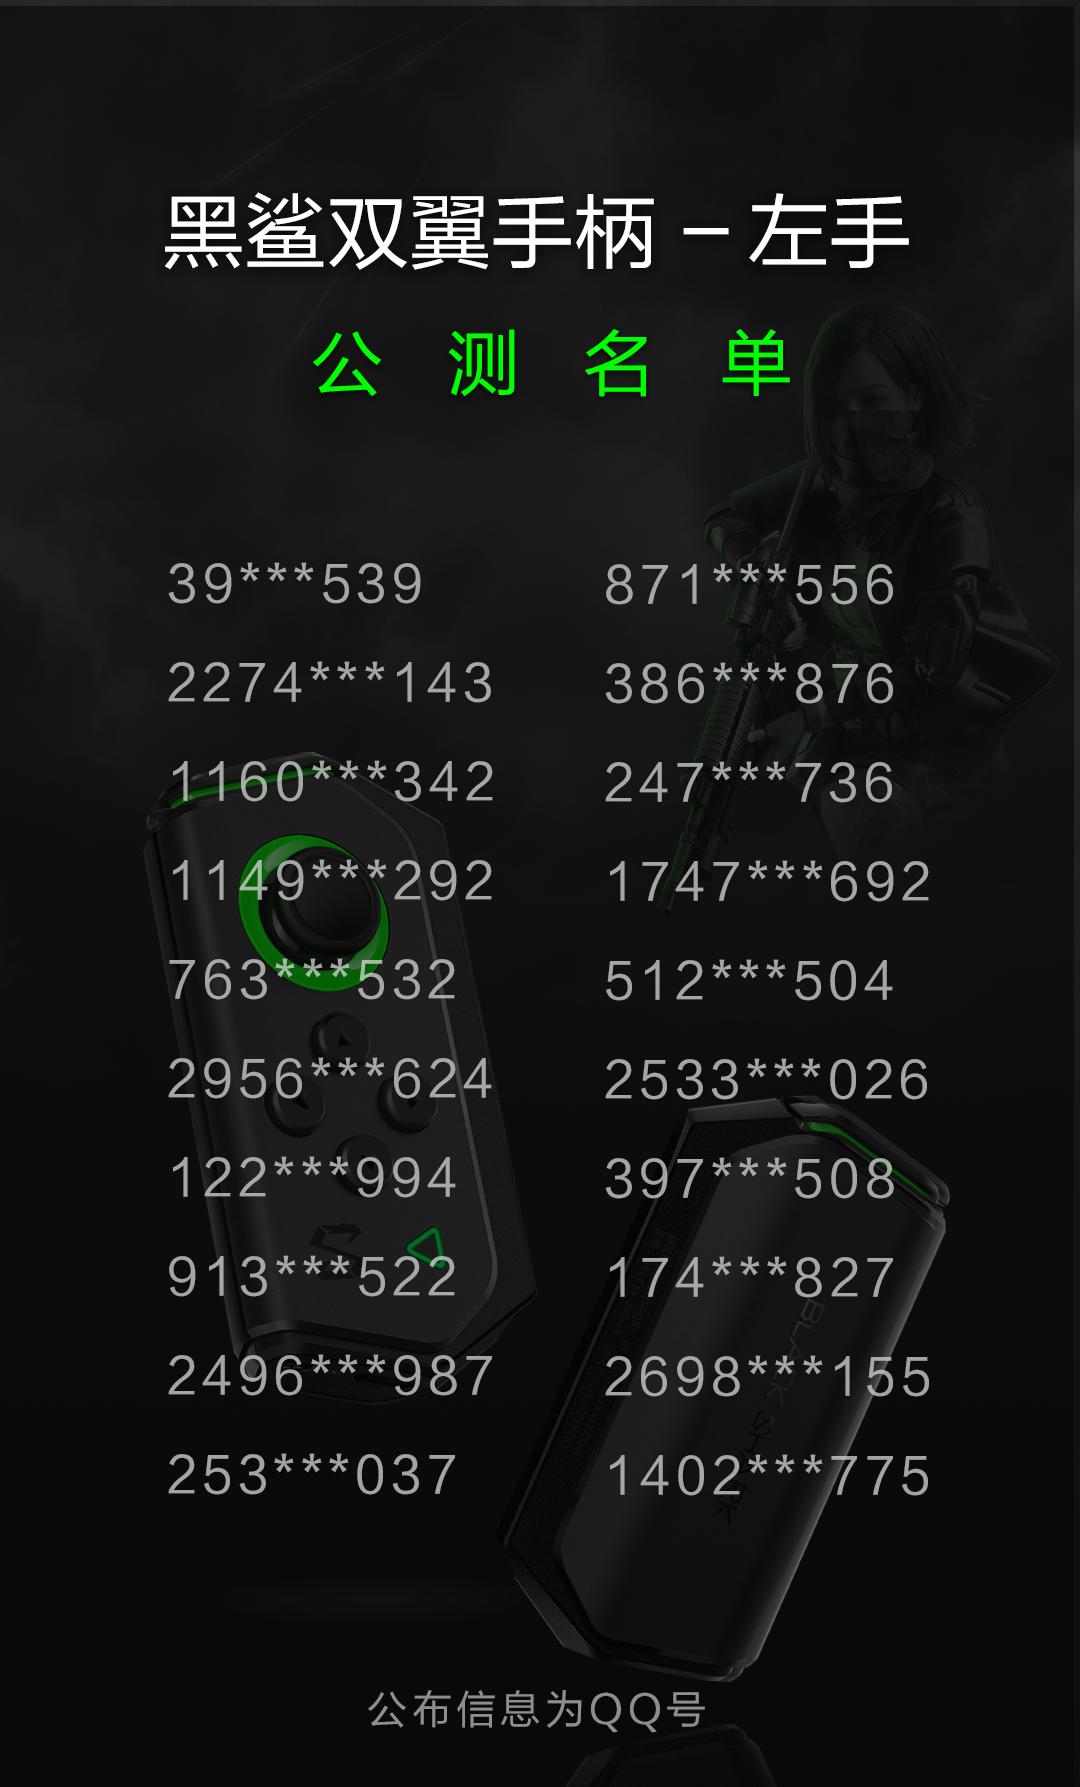 手柄公测名单-png(1).png